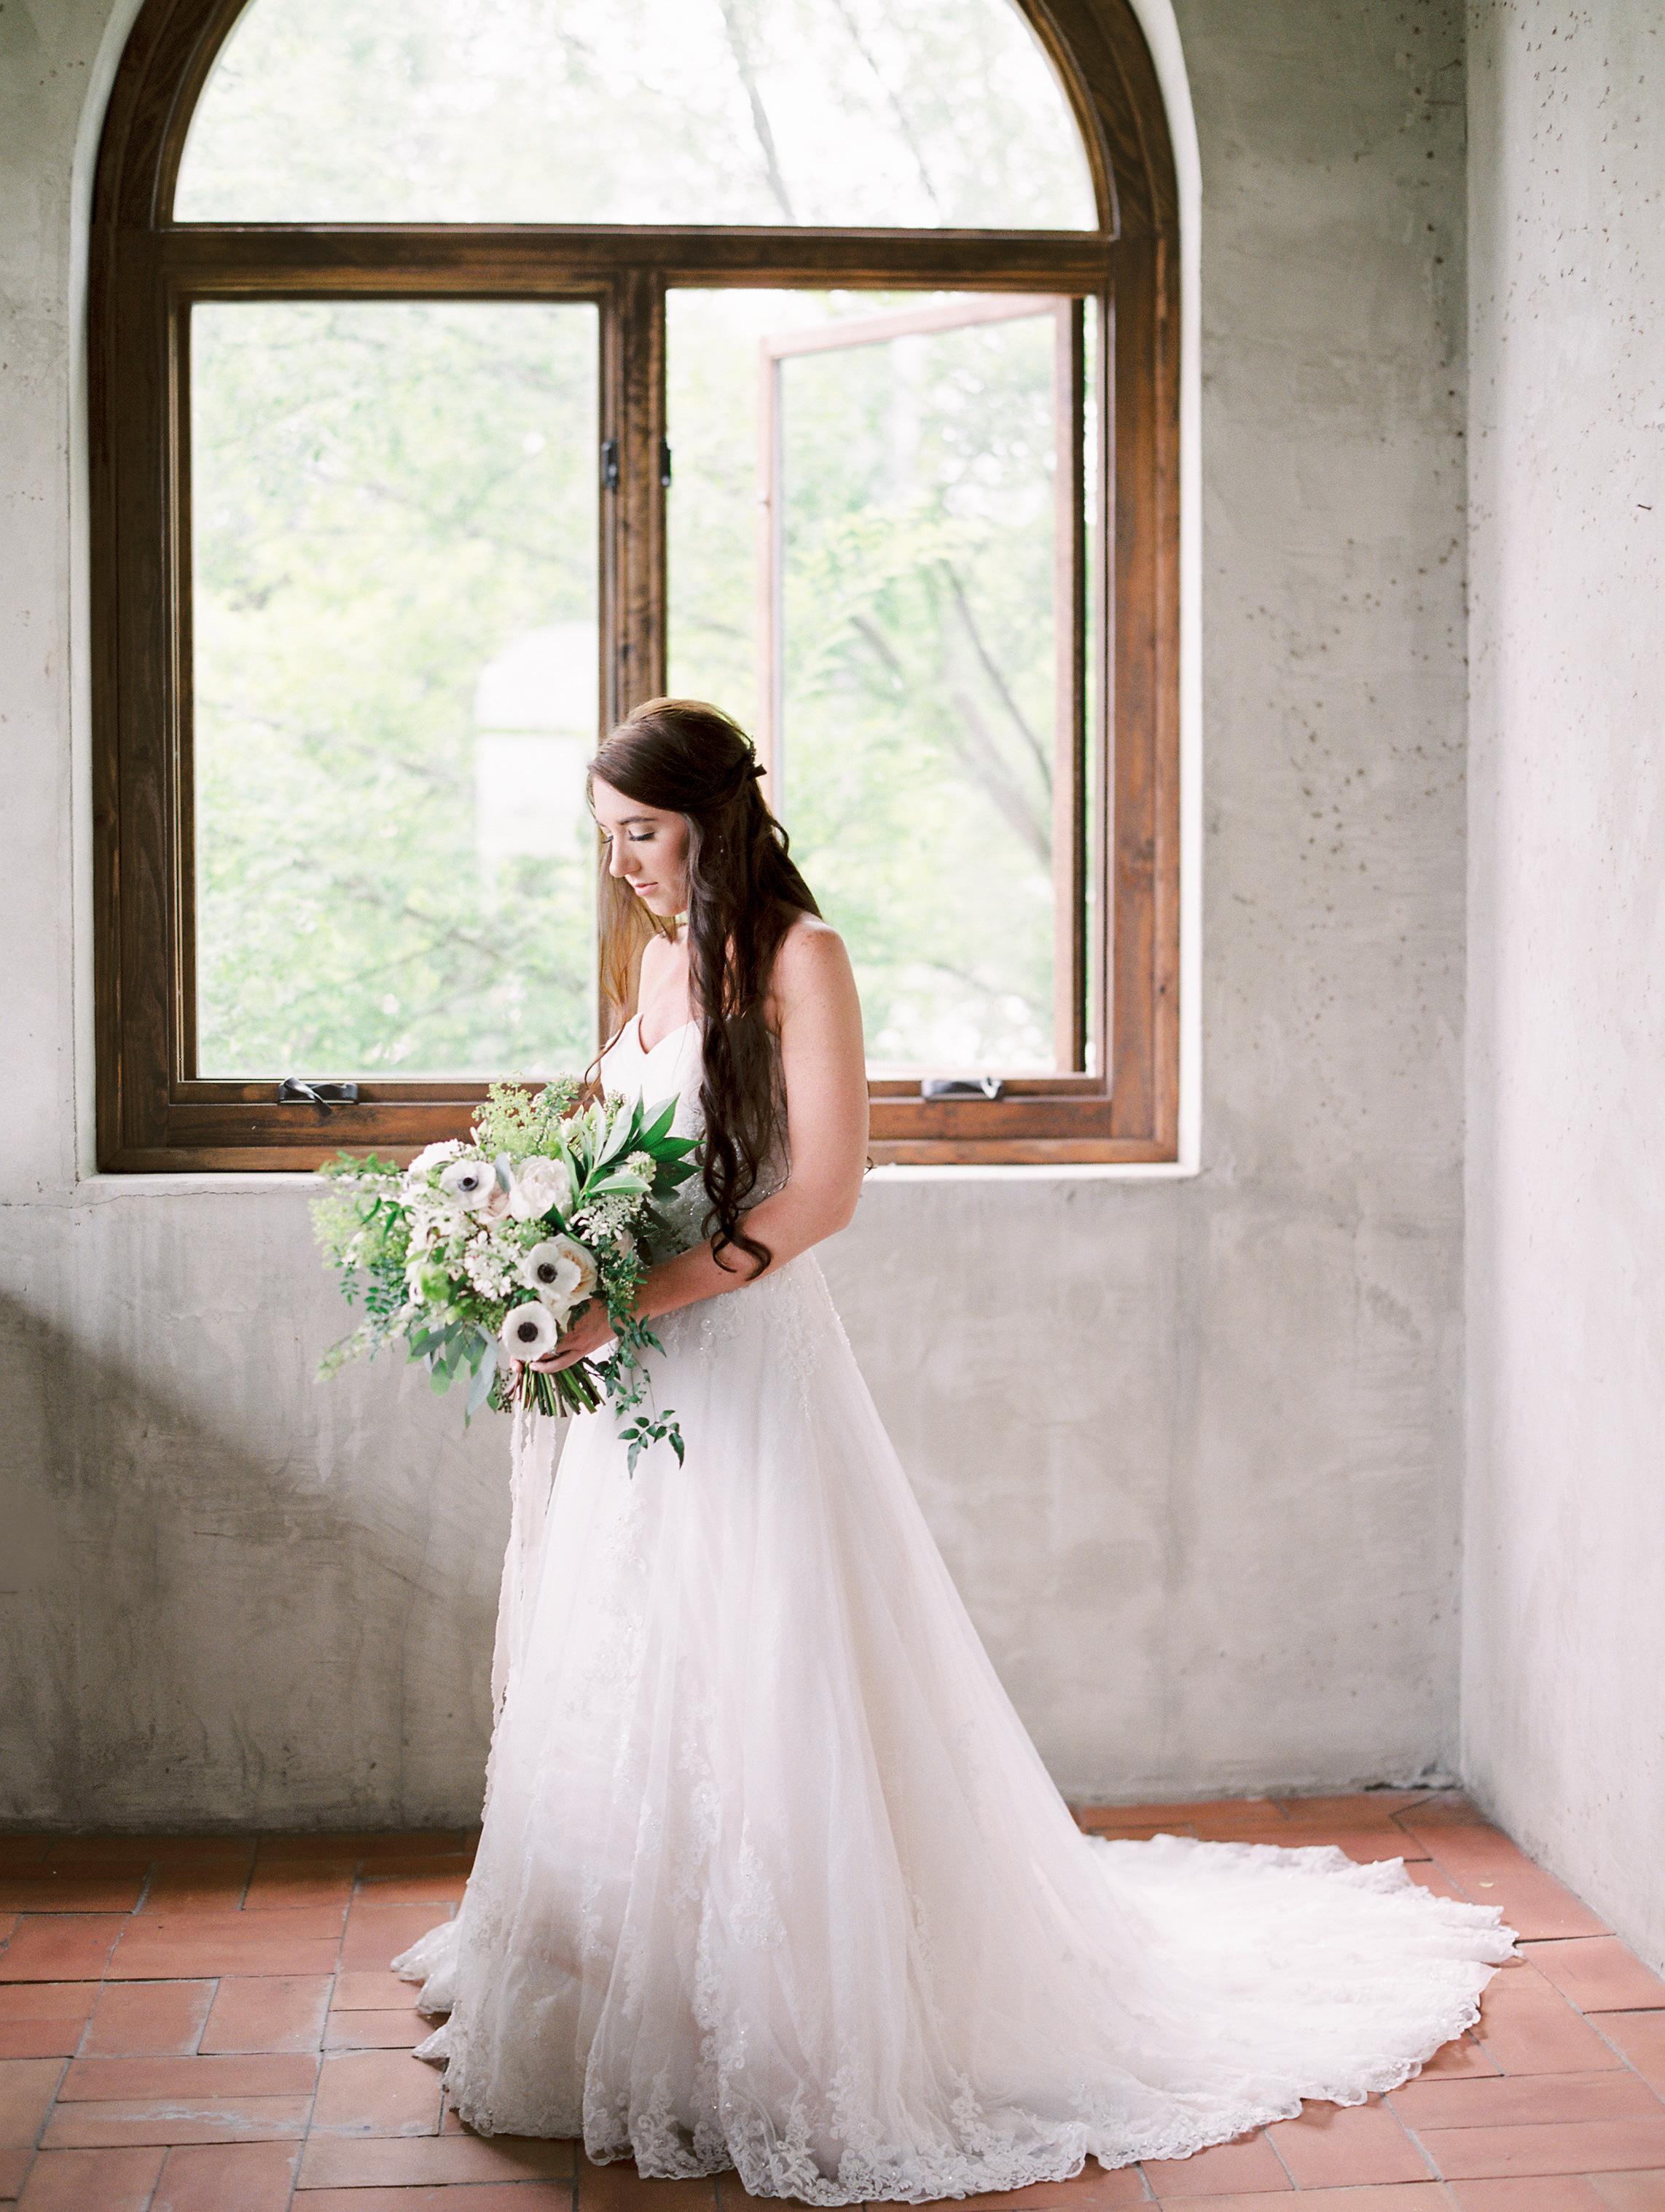 Romantic-Summerour-studio-wedding-hannah-forsberg-atlanta-wedding-photographer25.JPG